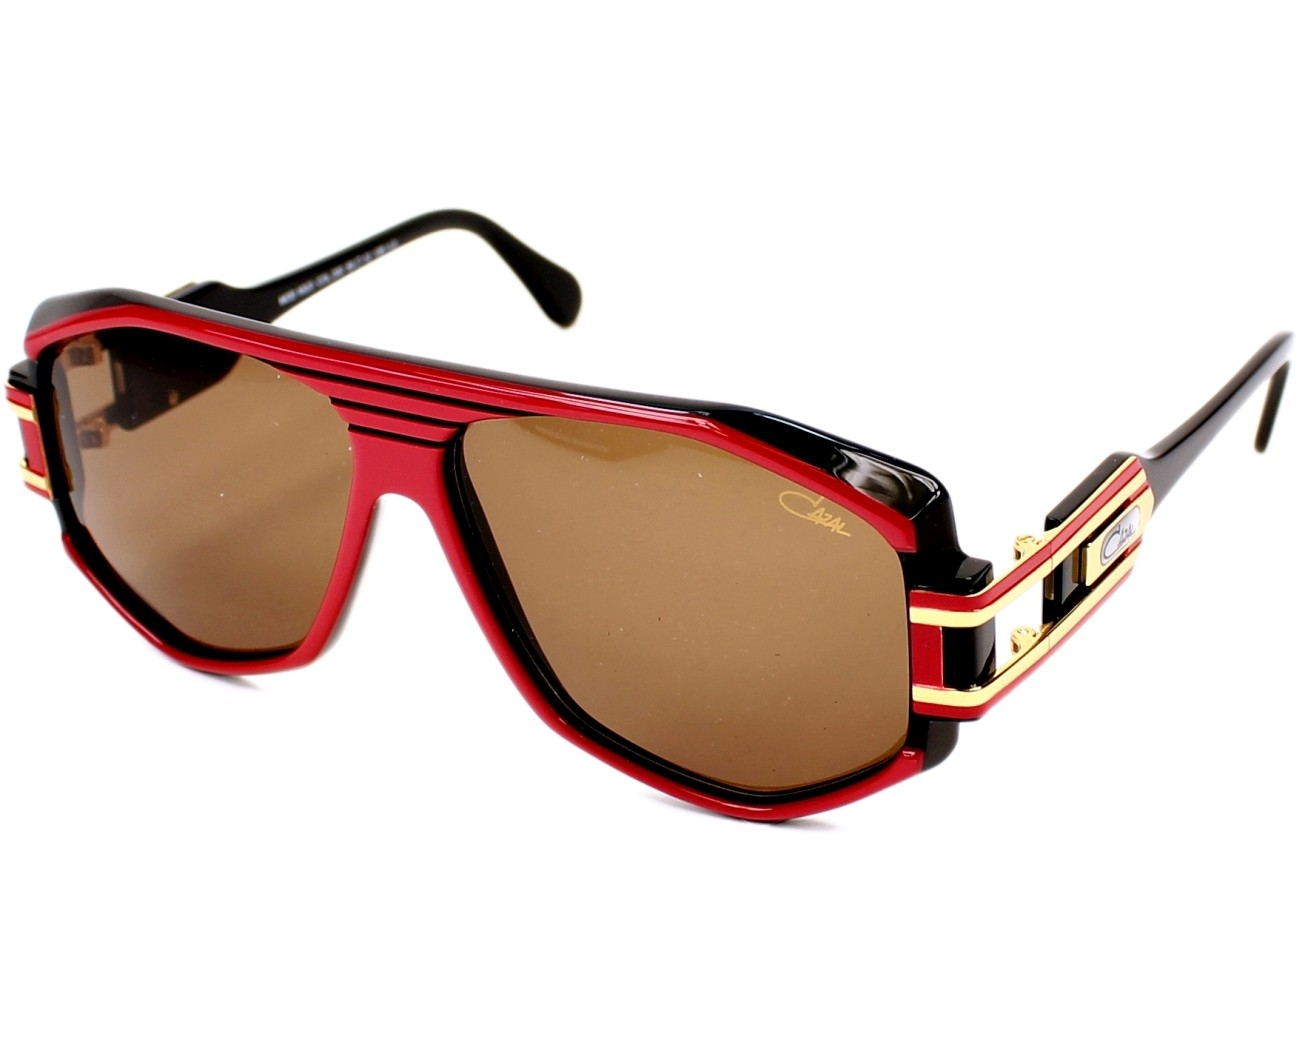 cazal sunglasses 163 3 200 59 visionet. Black Bedroom Furniture Sets. Home Design Ideas